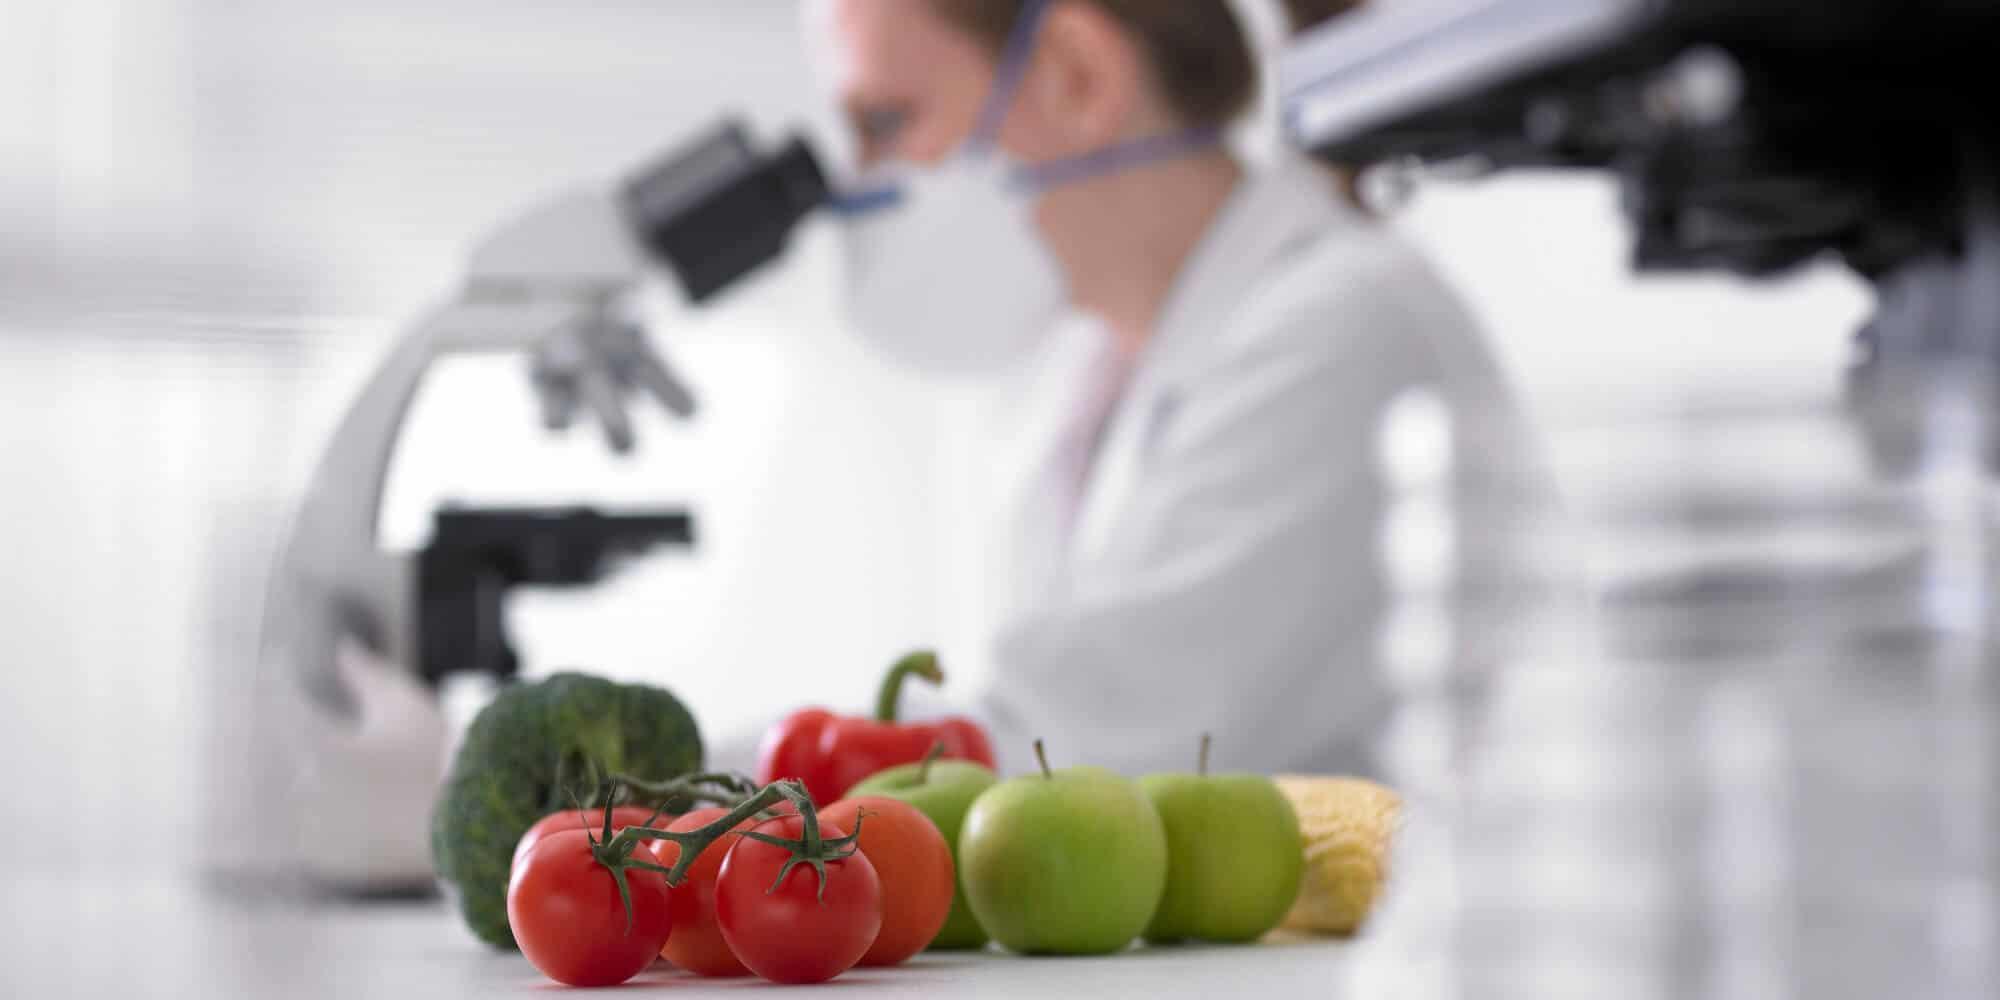 Are GMO food crops safe?